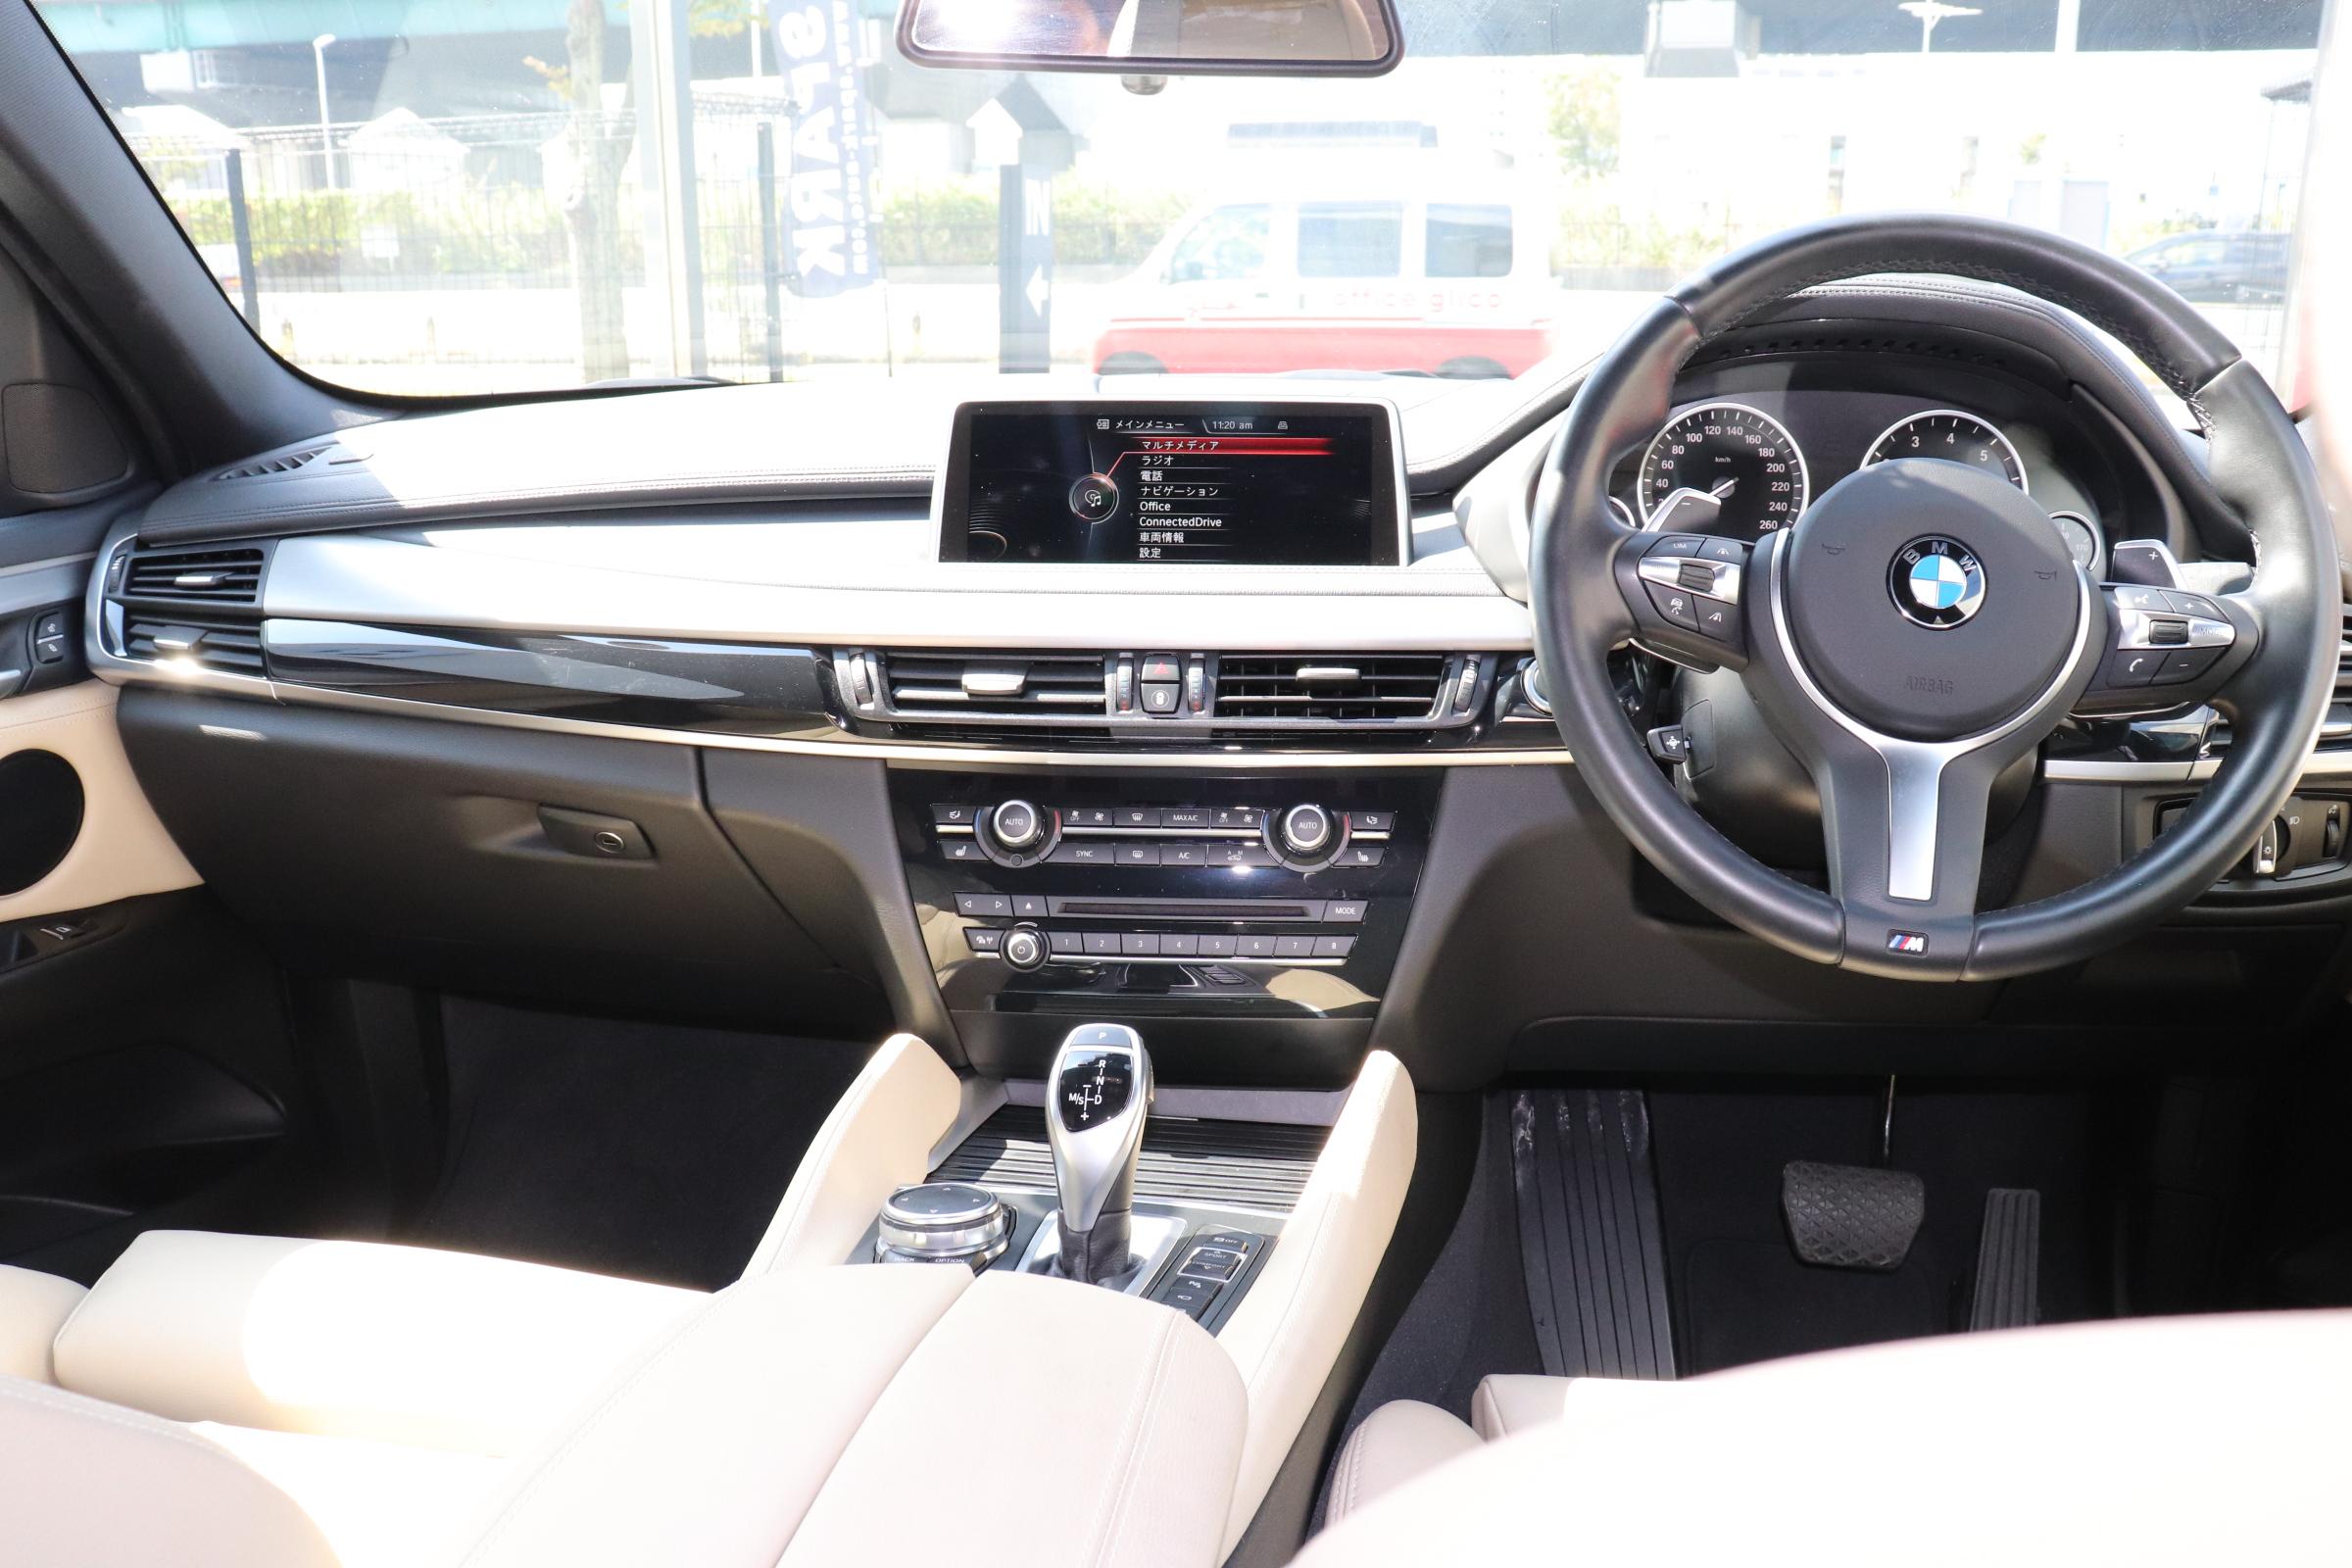 X6 xDrive35i Mスポーツ サンルーフ ヘッドアップディスプレイ パワーバックドア車両画像14